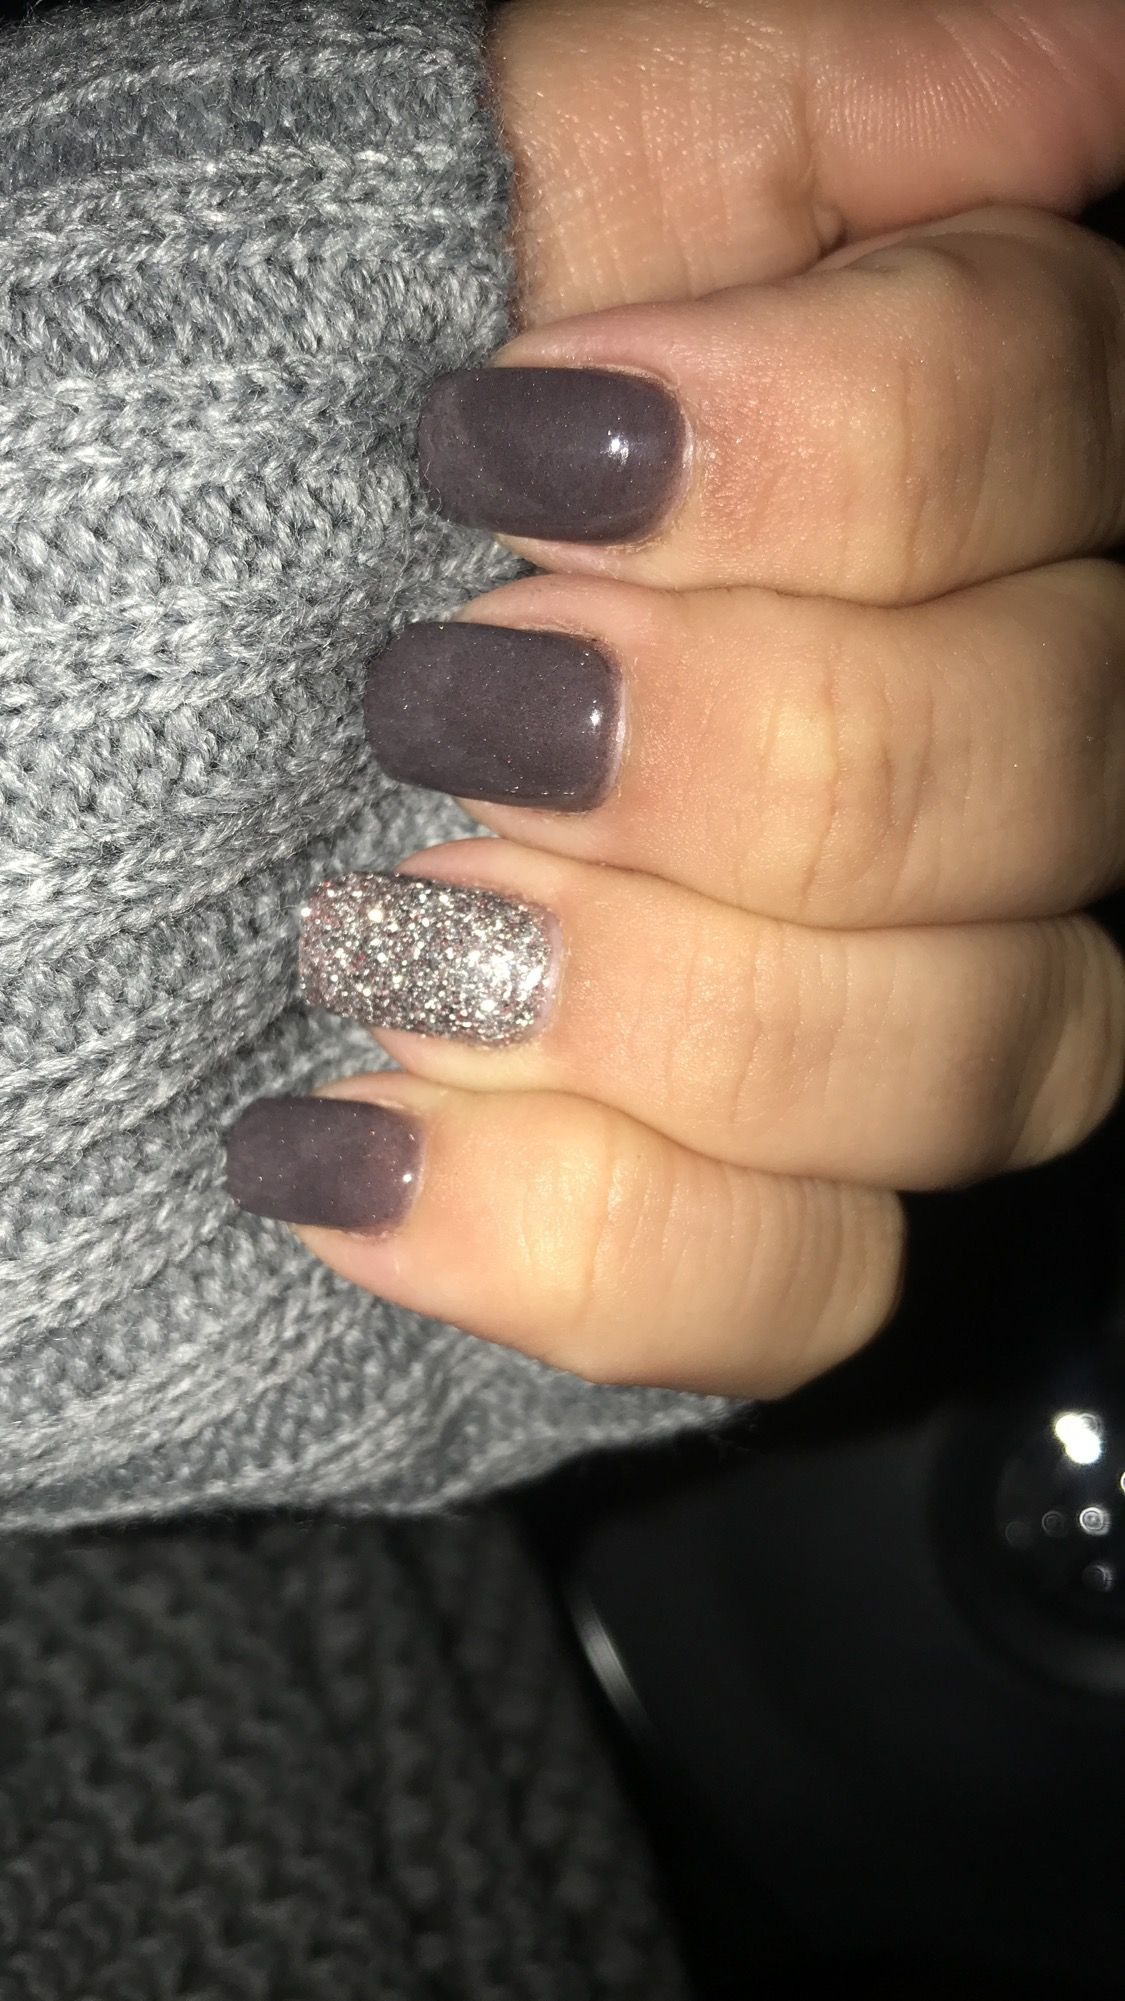 Love my fall color SNS nails | Nails | Pinterest | Sns nails, Fall ...